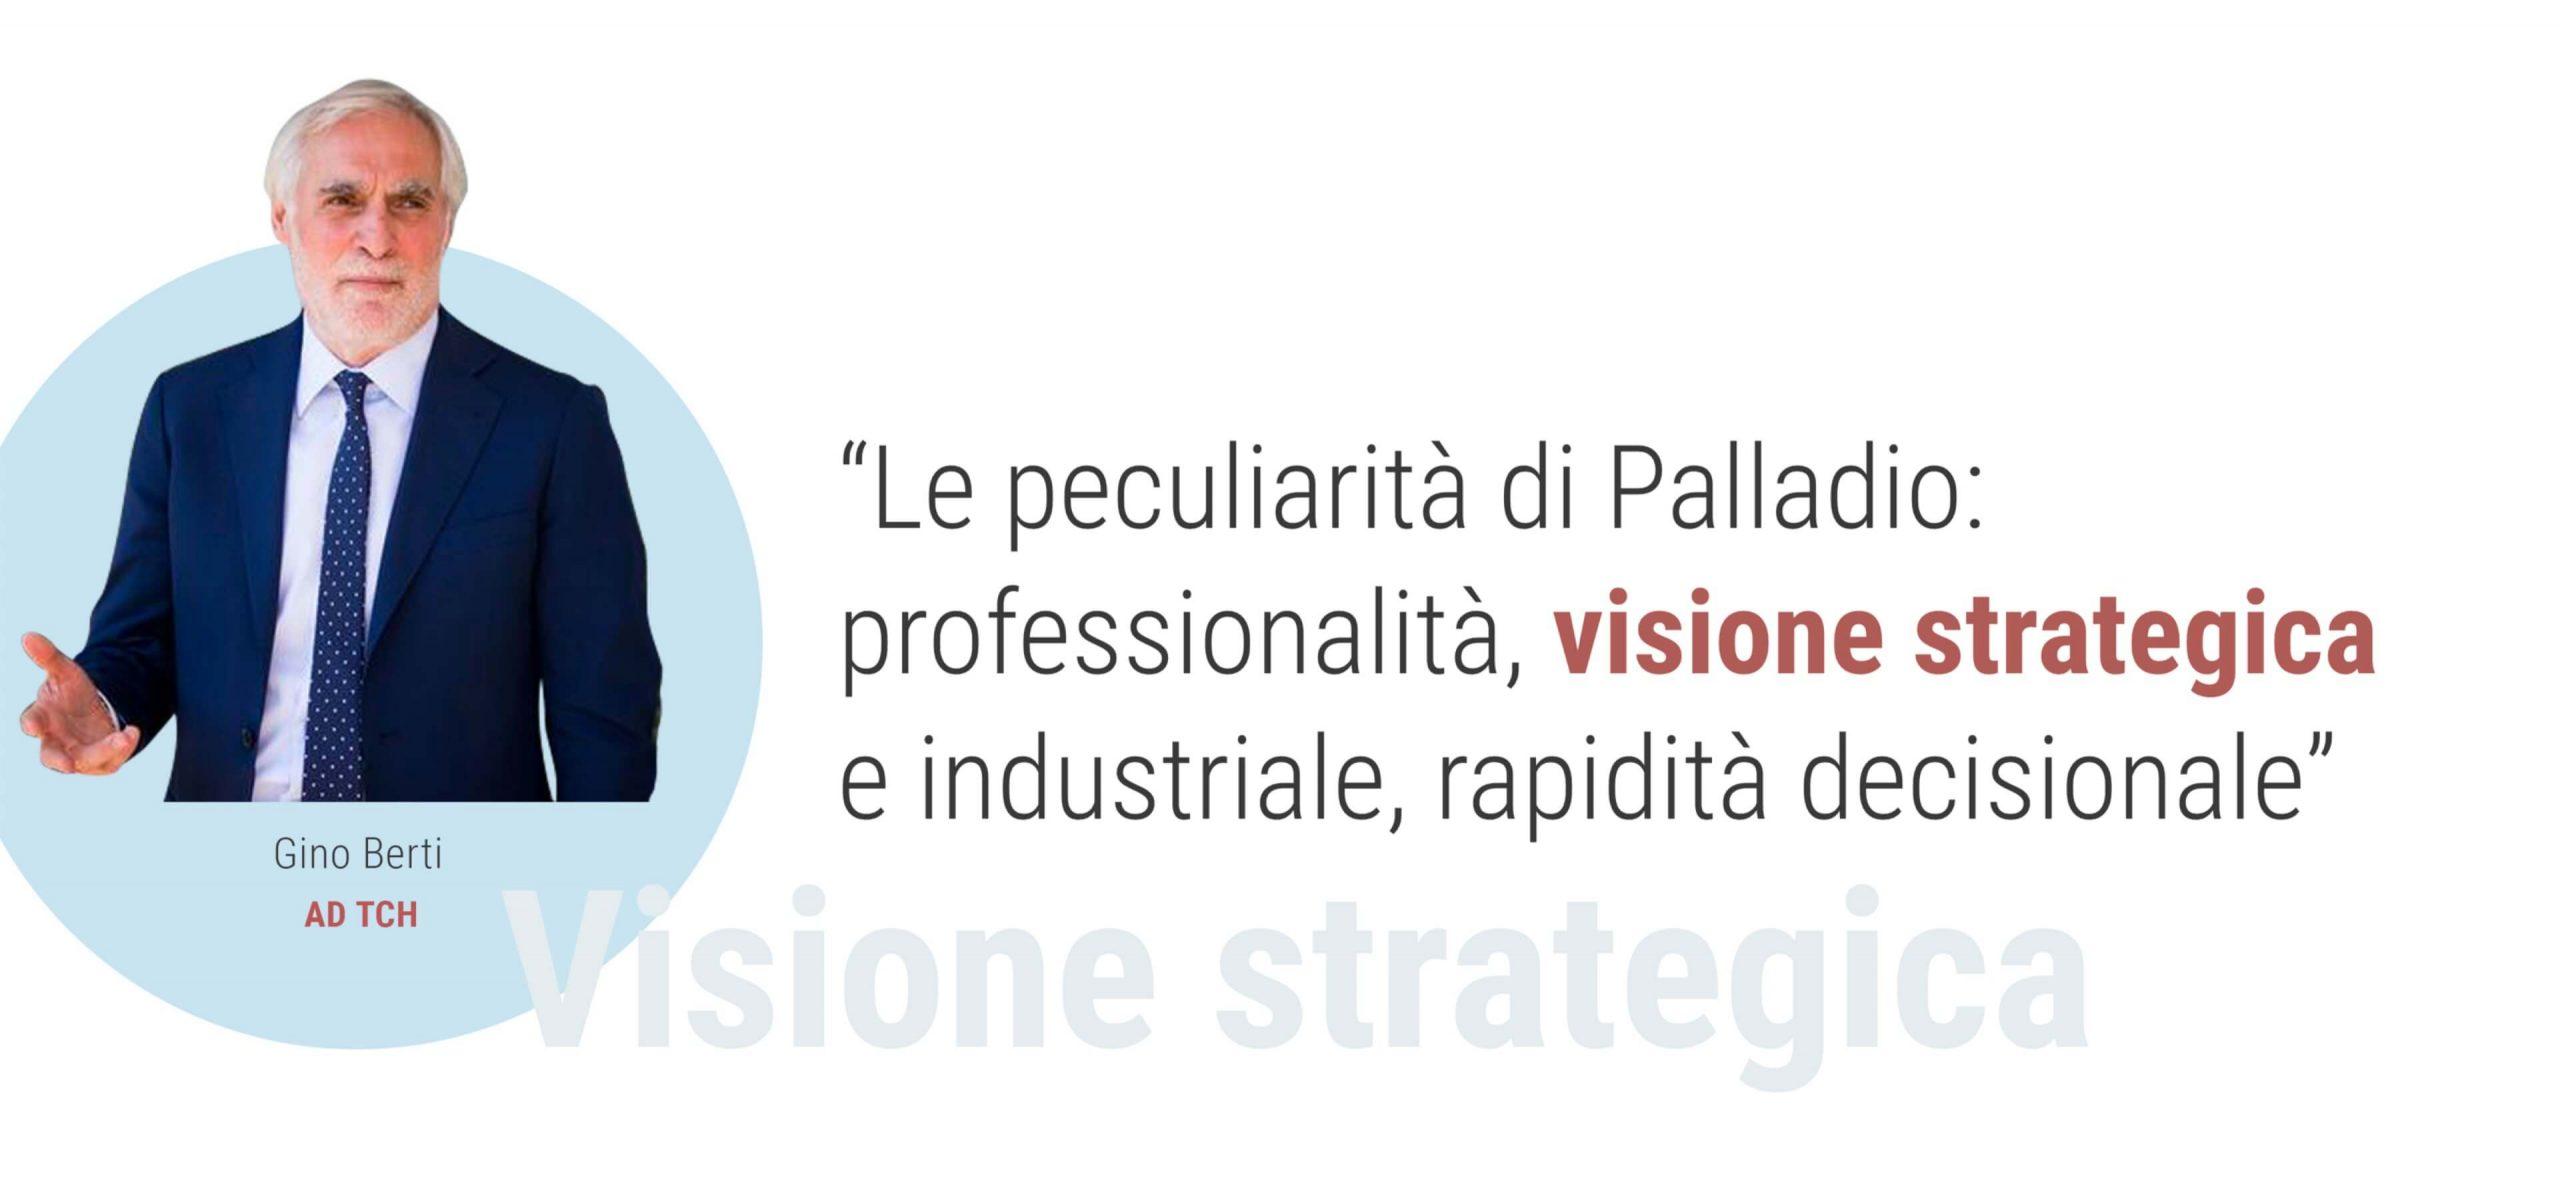 Gino Berti - Visione strategica